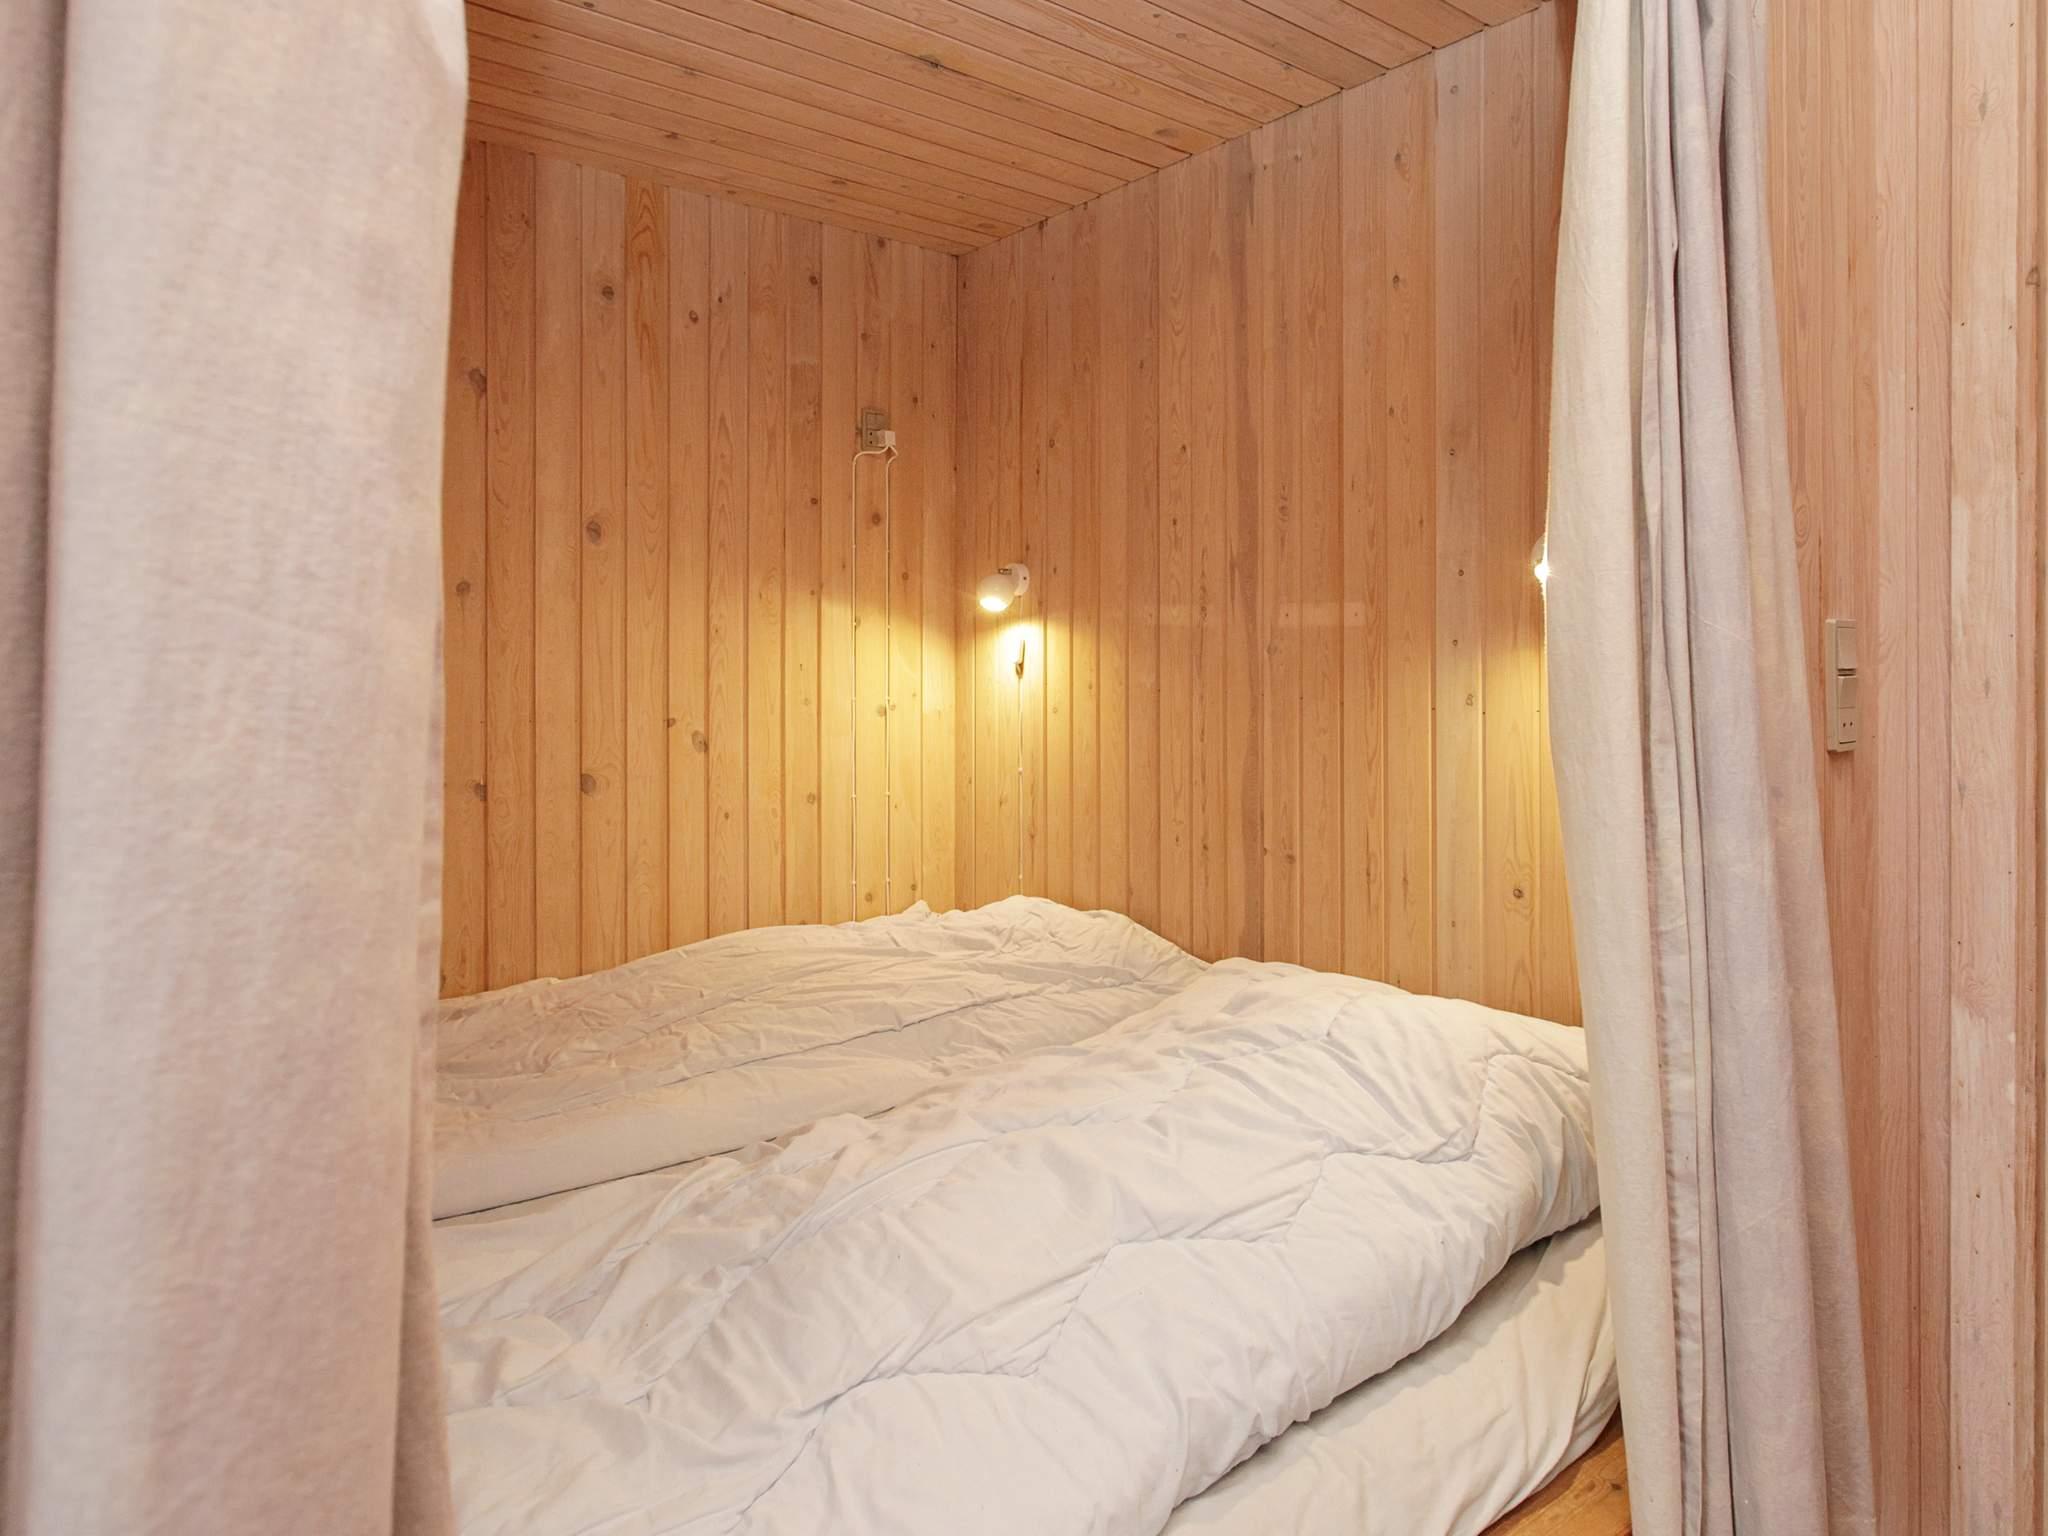 Ferienhaus Fredmosen (596960), Humble, , Langeland, Dänemark, Bild 10